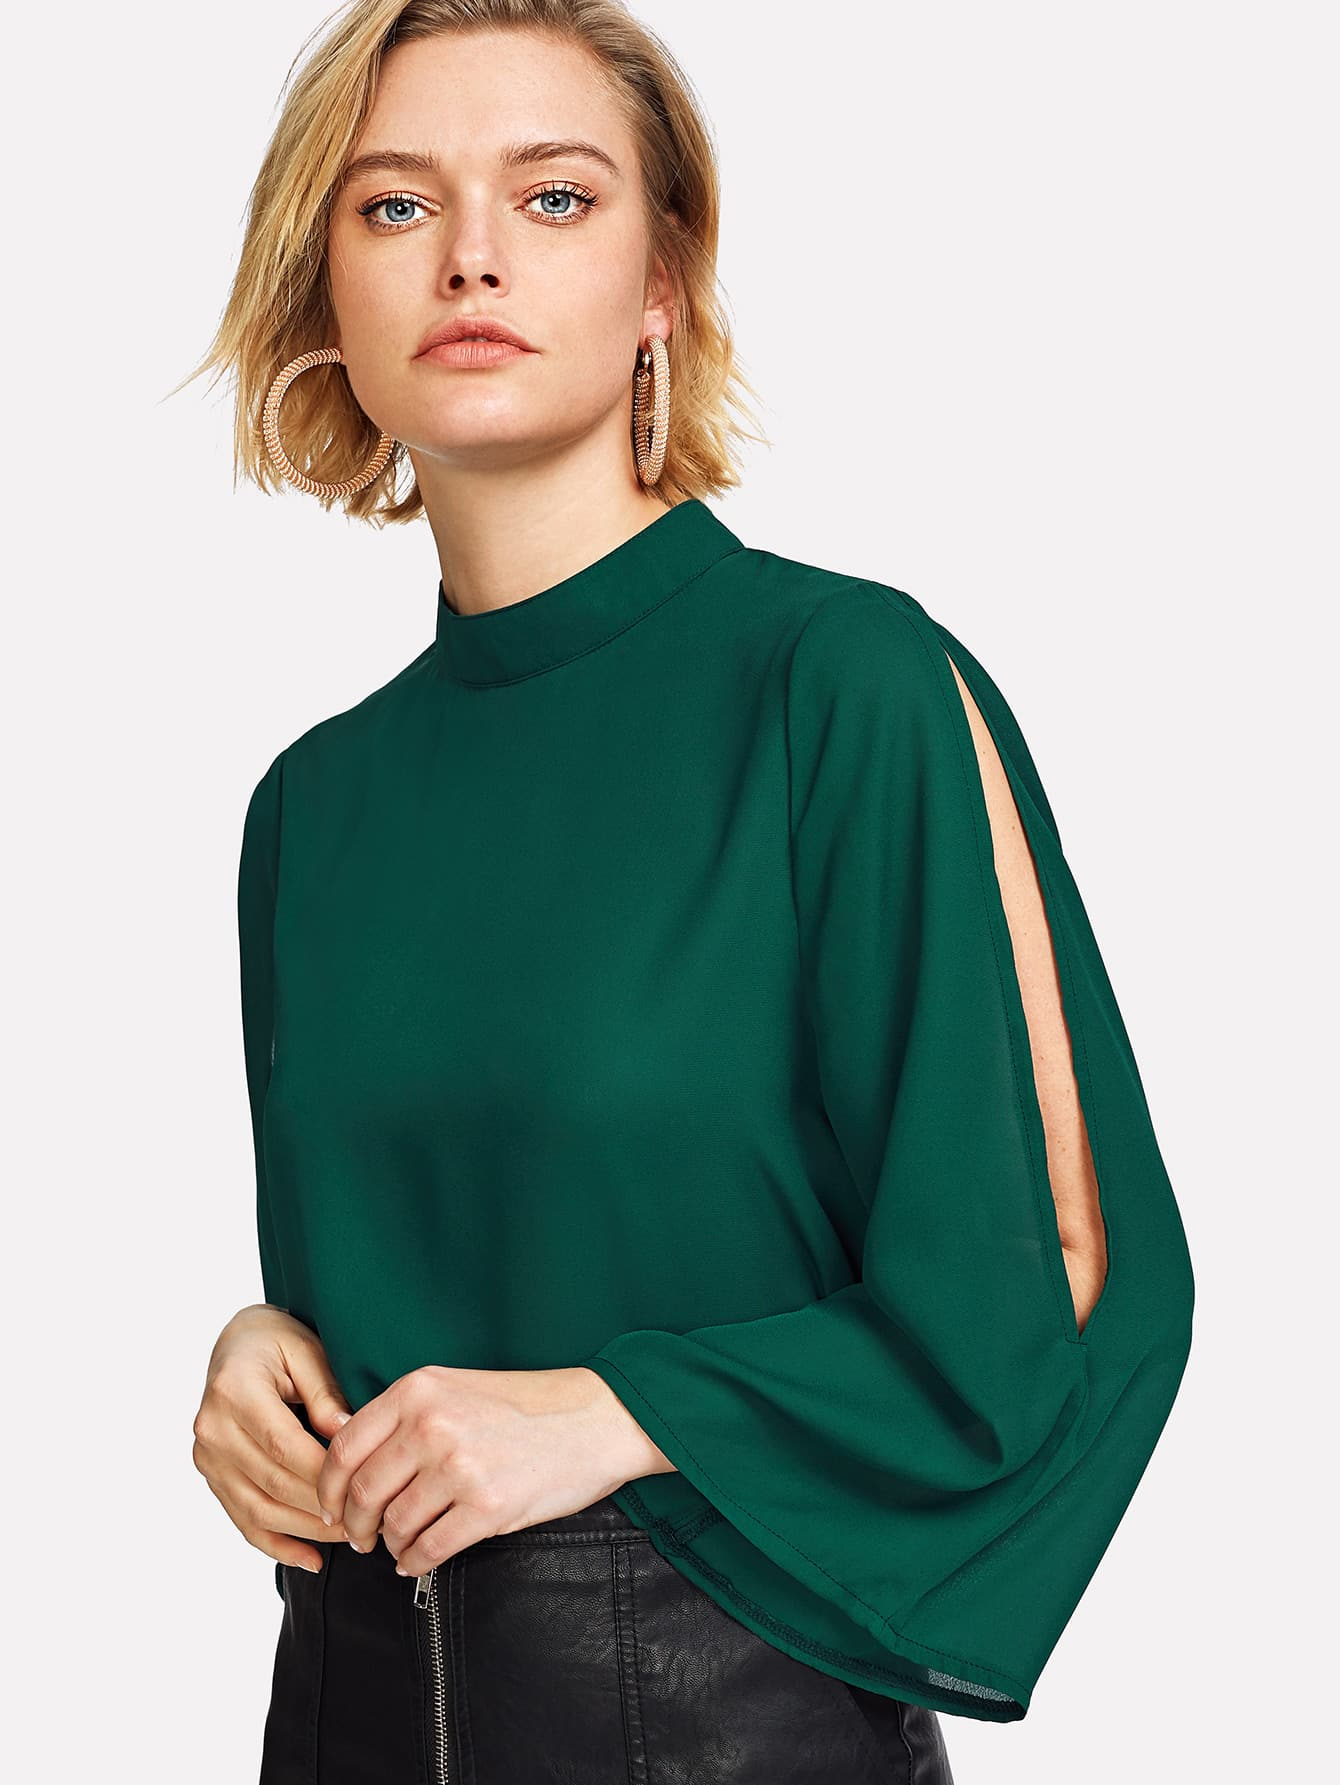 Купить Модная блуза с вырезом, Michelle, SheIn